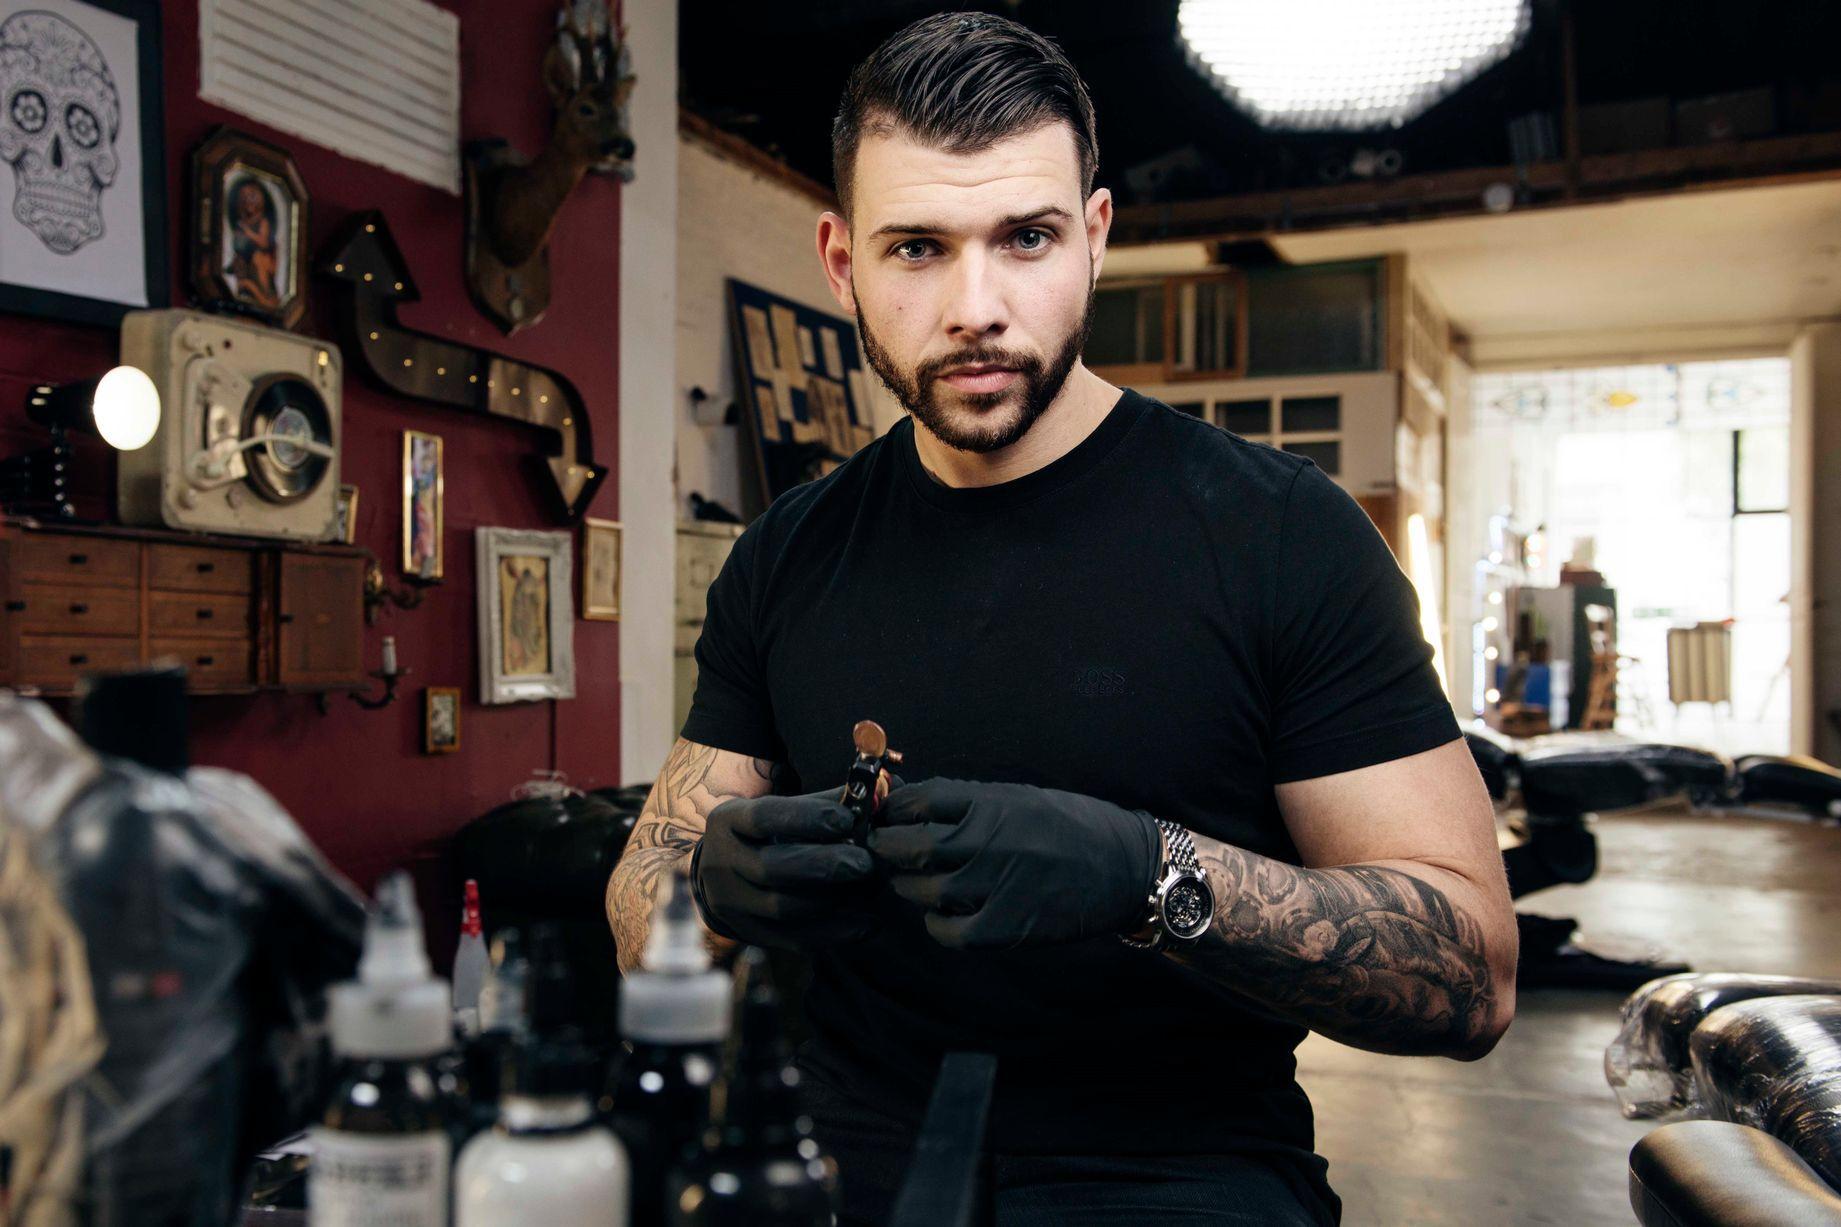 d3304dd8e Jay - tattoo fixers   Hombres//   Tattoo fixers, Tattoo fixes ...